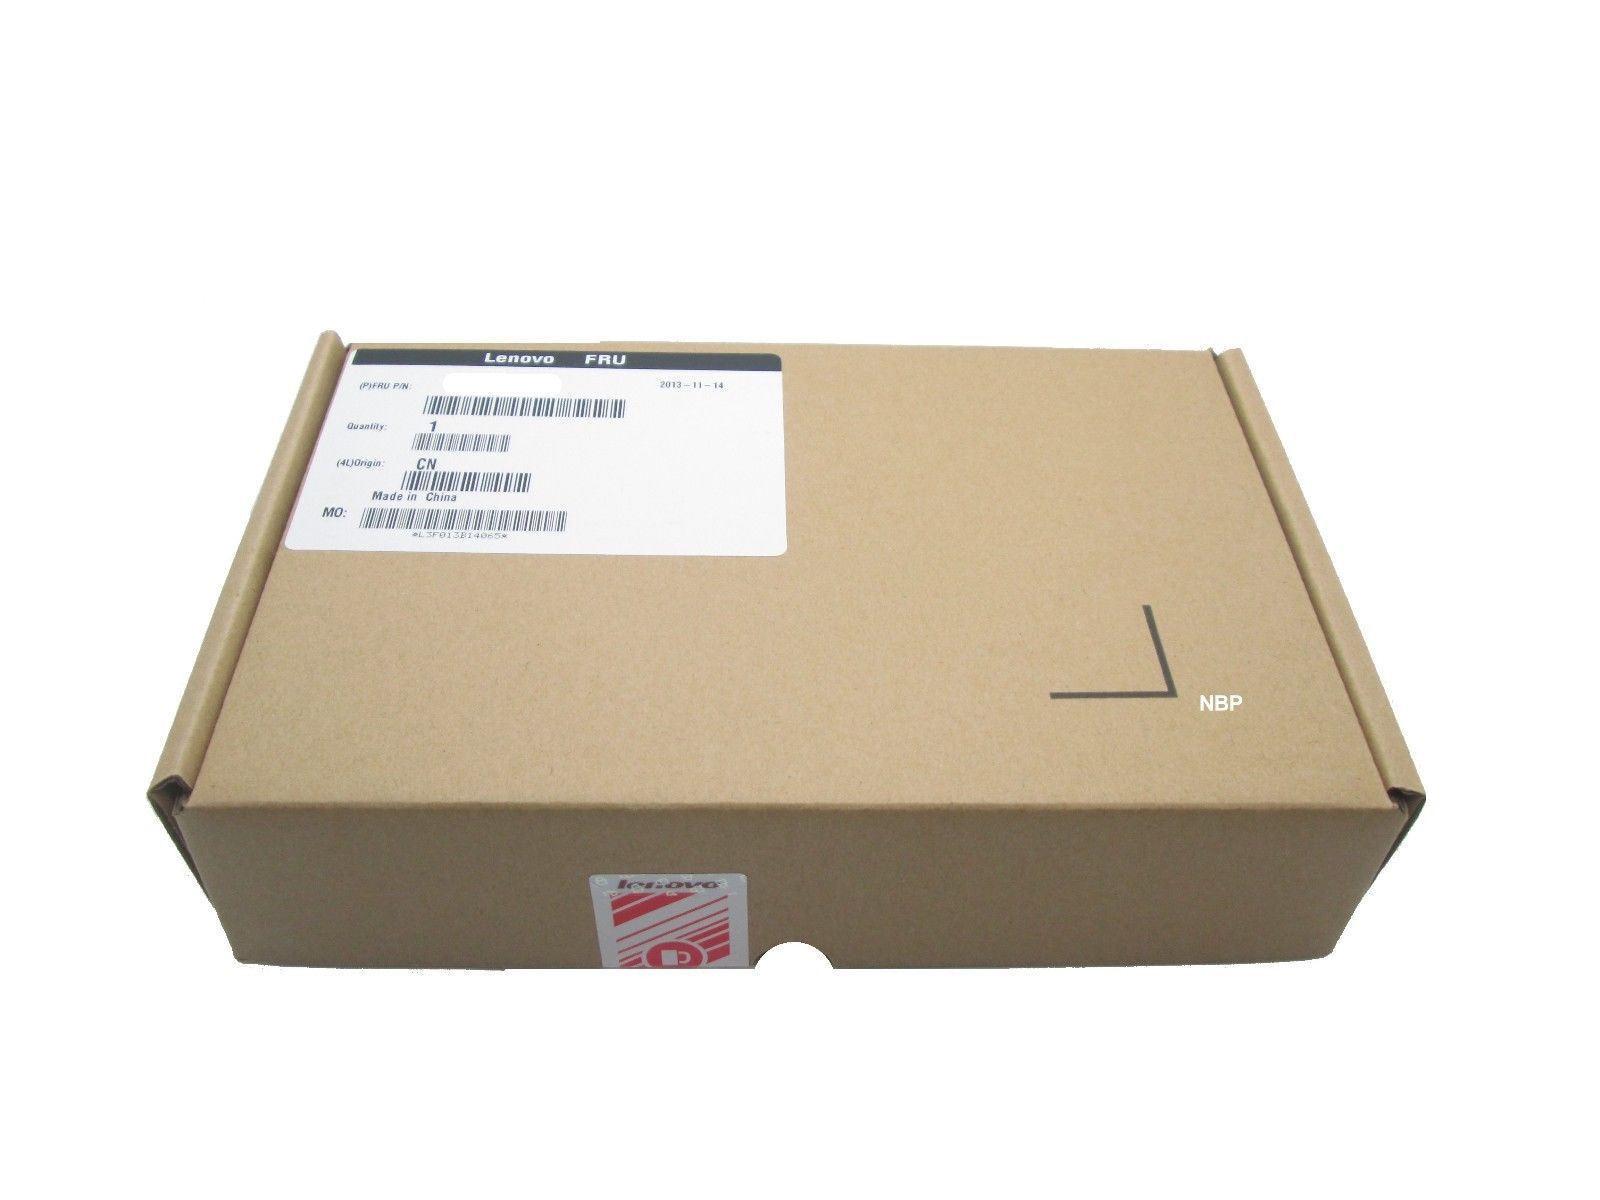 Genuine Lenovo Thinkpad Tablet 2 Home Botton Board 04x0389